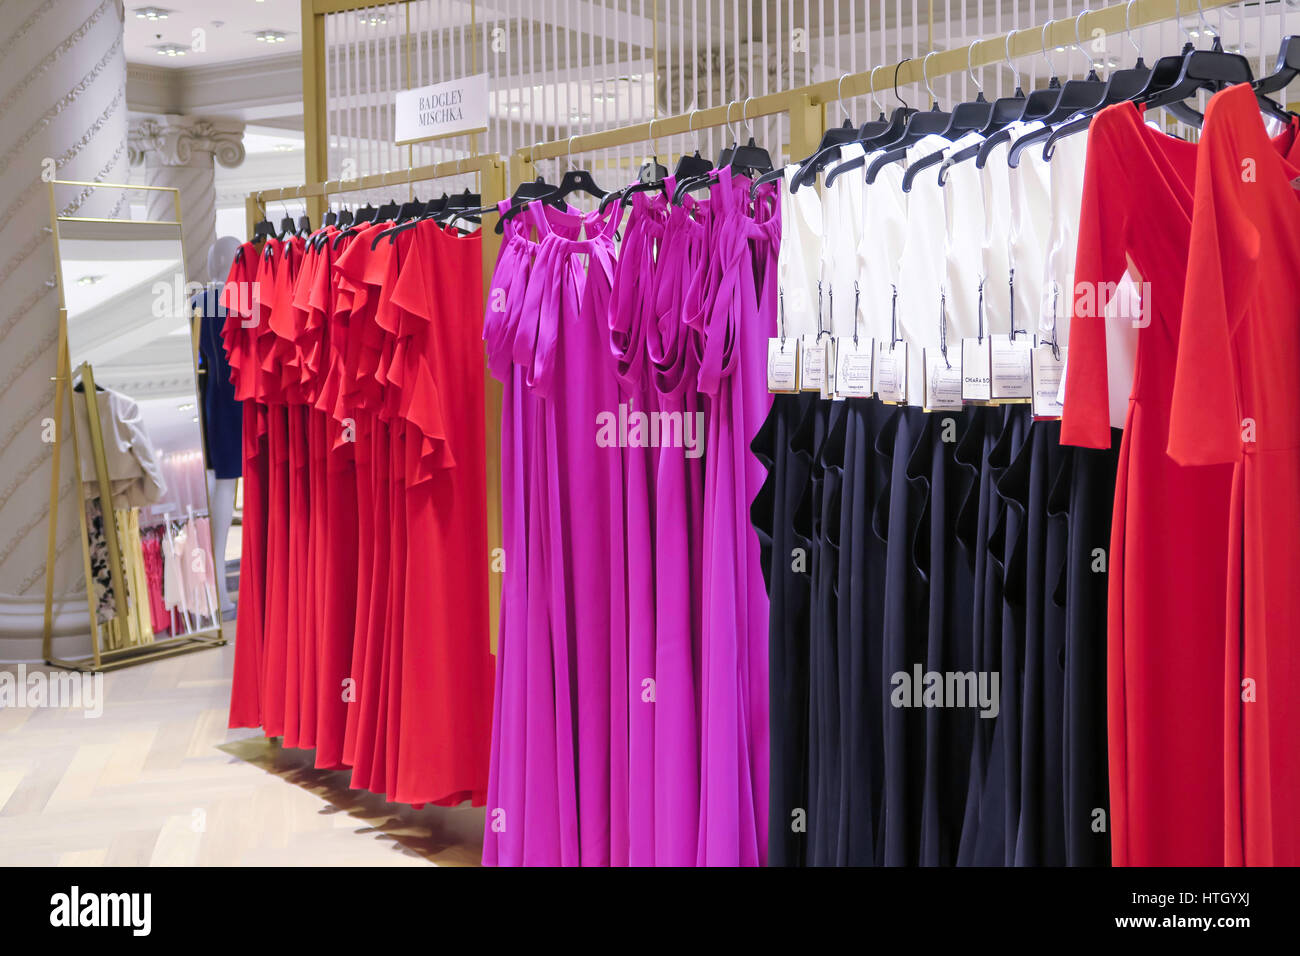 Formal Dresses Imágenes De Stock & Formal Dresses Fotos De Stock - Alamy